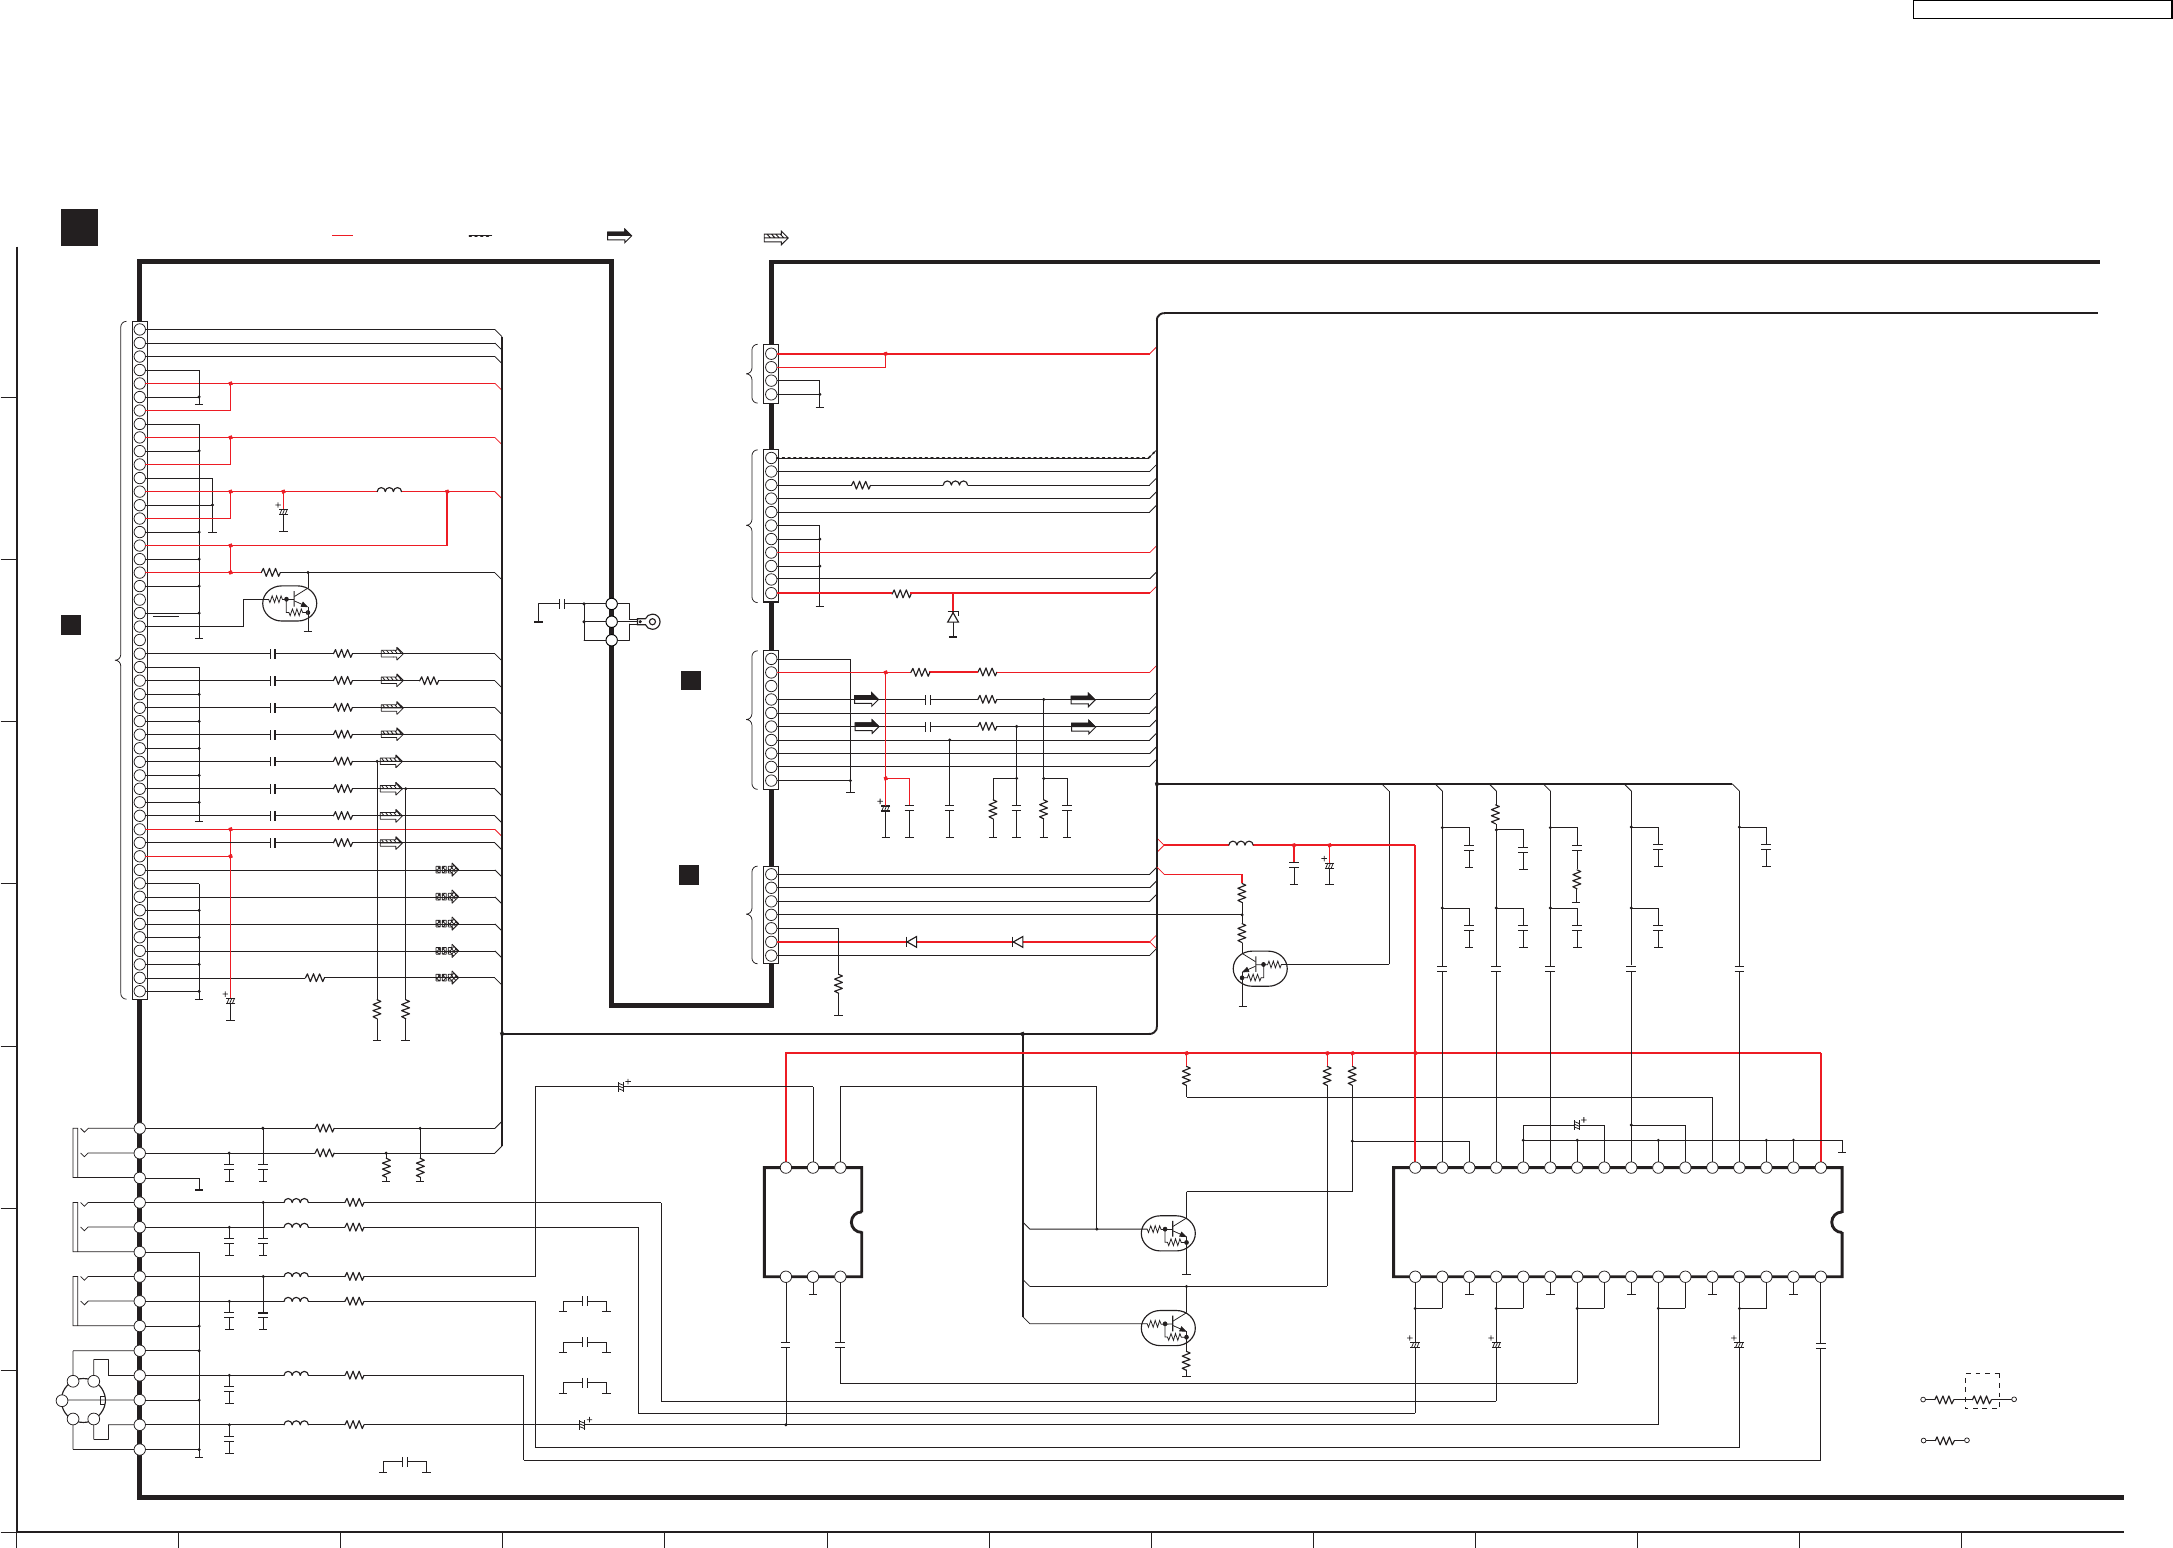 Technics Saht 340 Gc Gs Gcs Service Manual 1w 4w 6w 10w 12w Led Driver Circuit Smps Making Easy Circuits B Main Fl Volume Mic